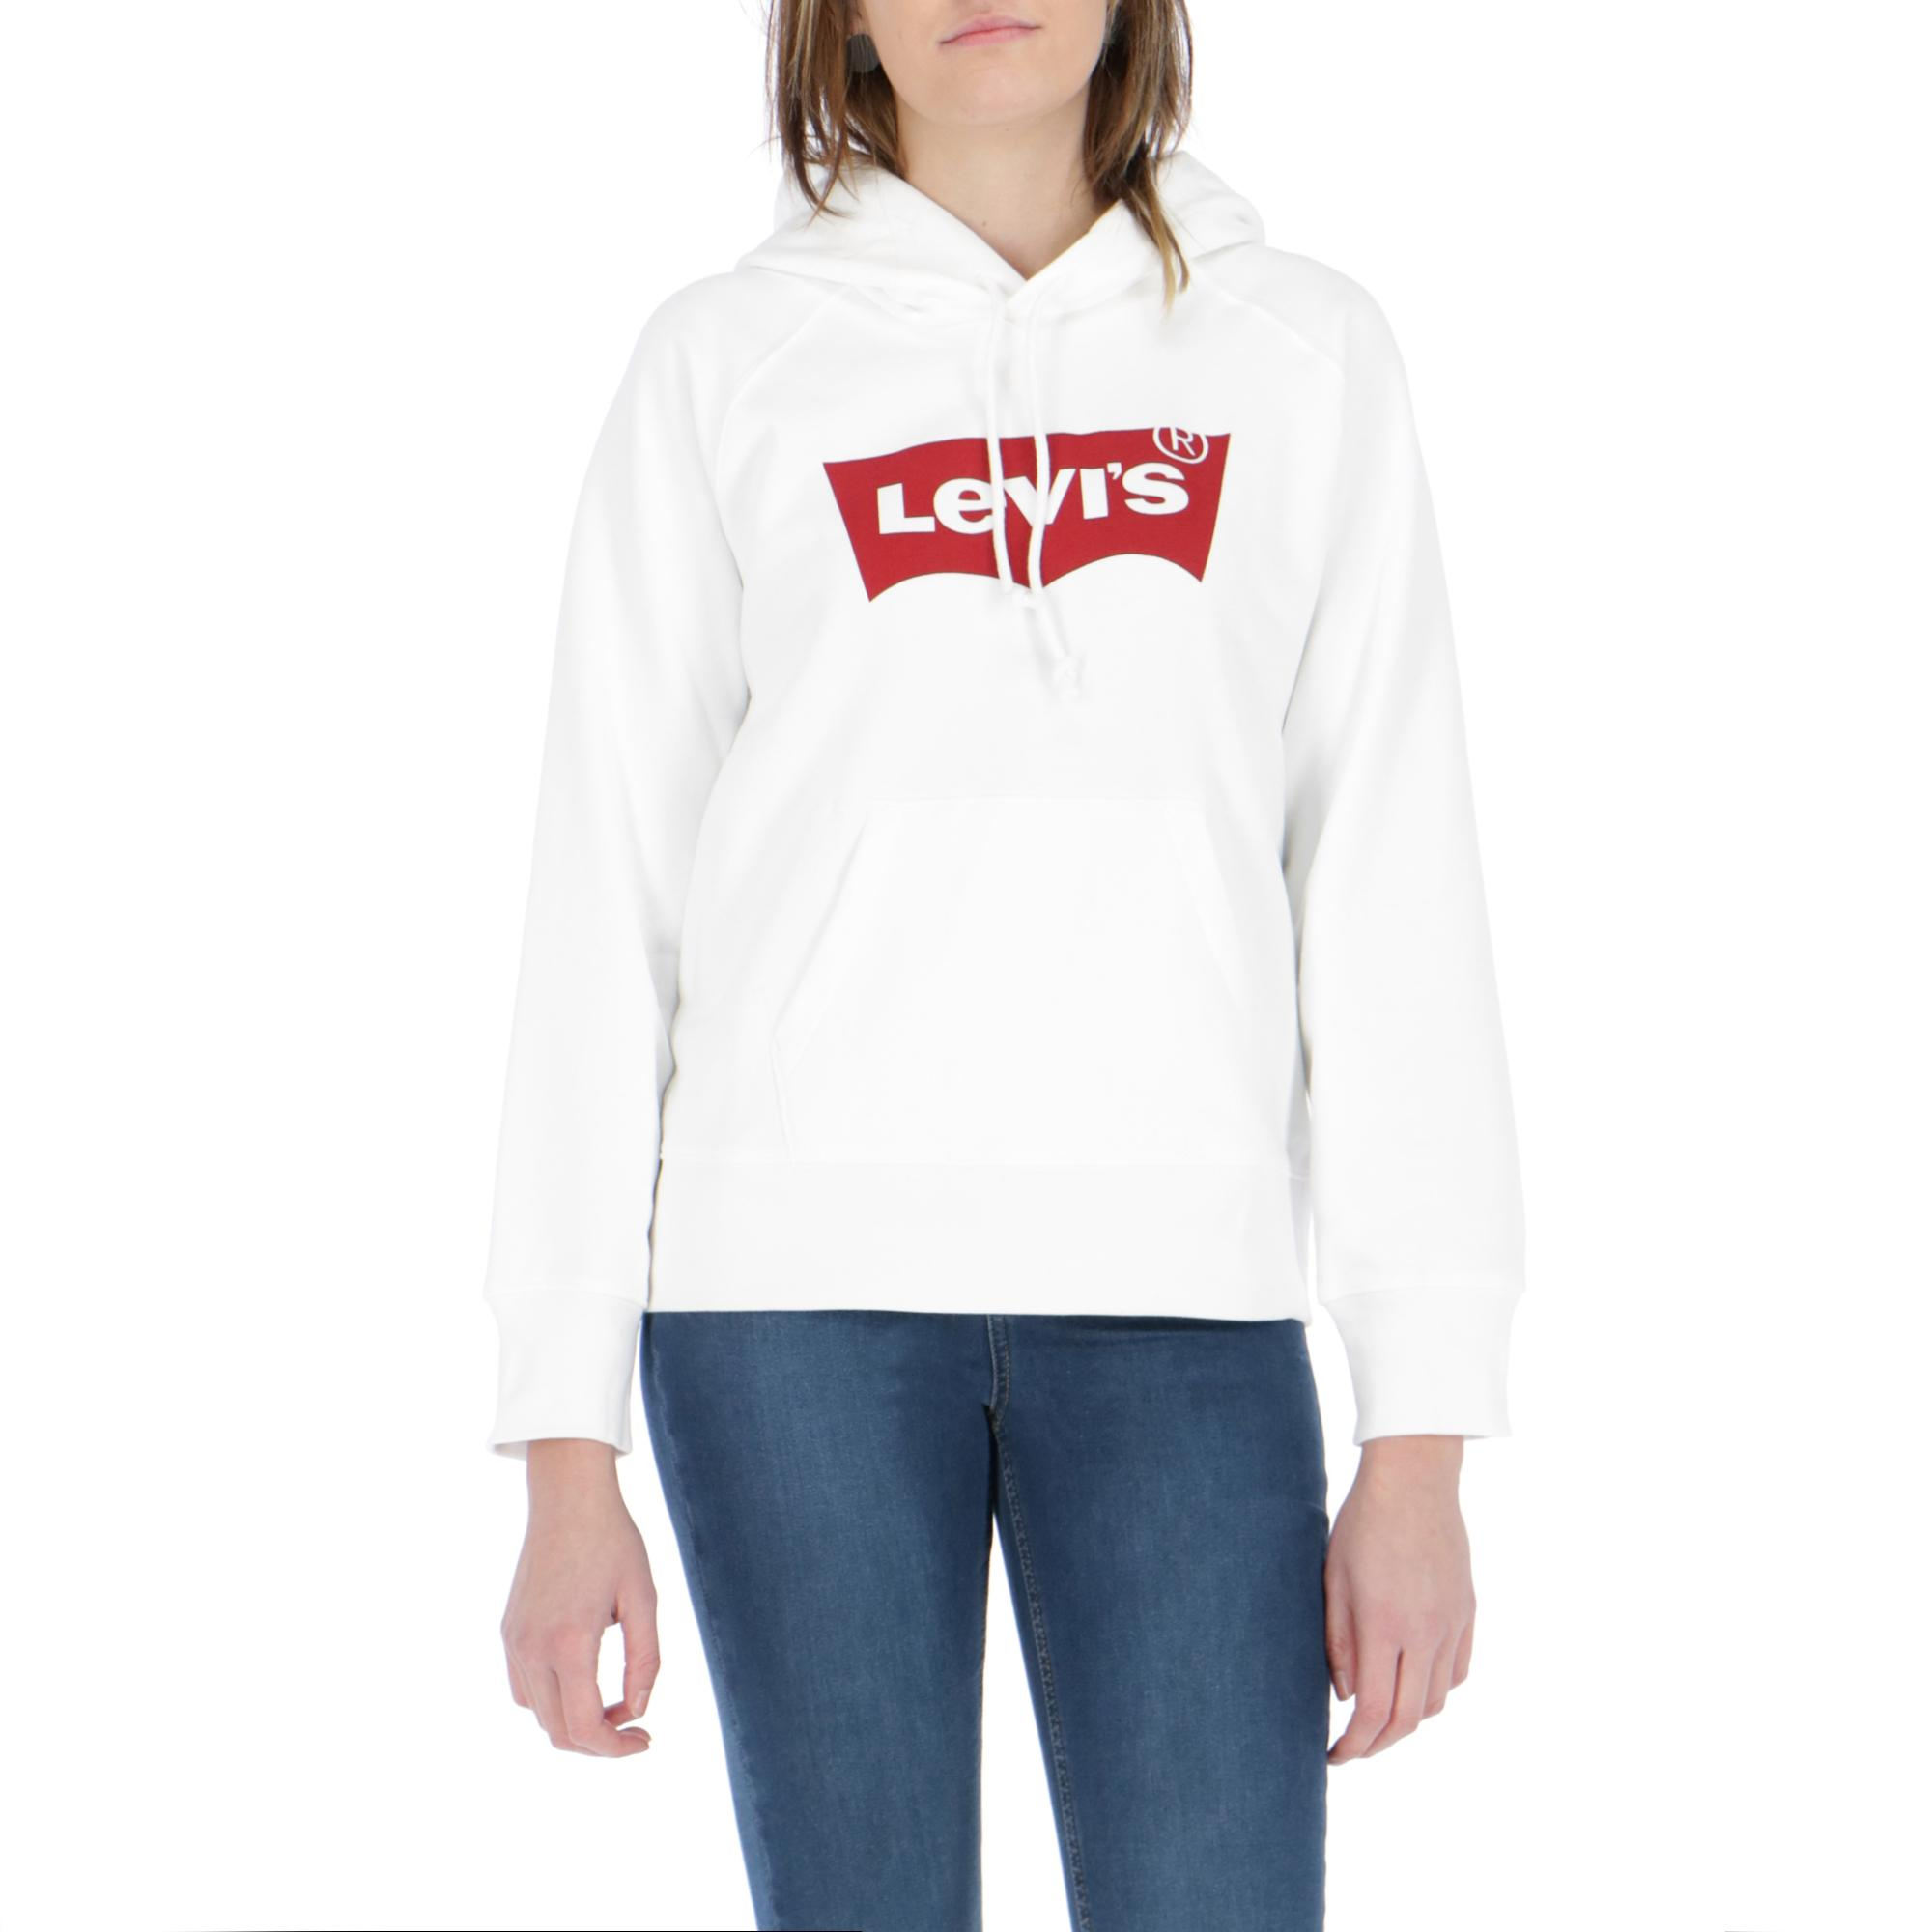 8b71ff80a5657 Levi's Graphic Sport Hoodie Housemark White | Treesse